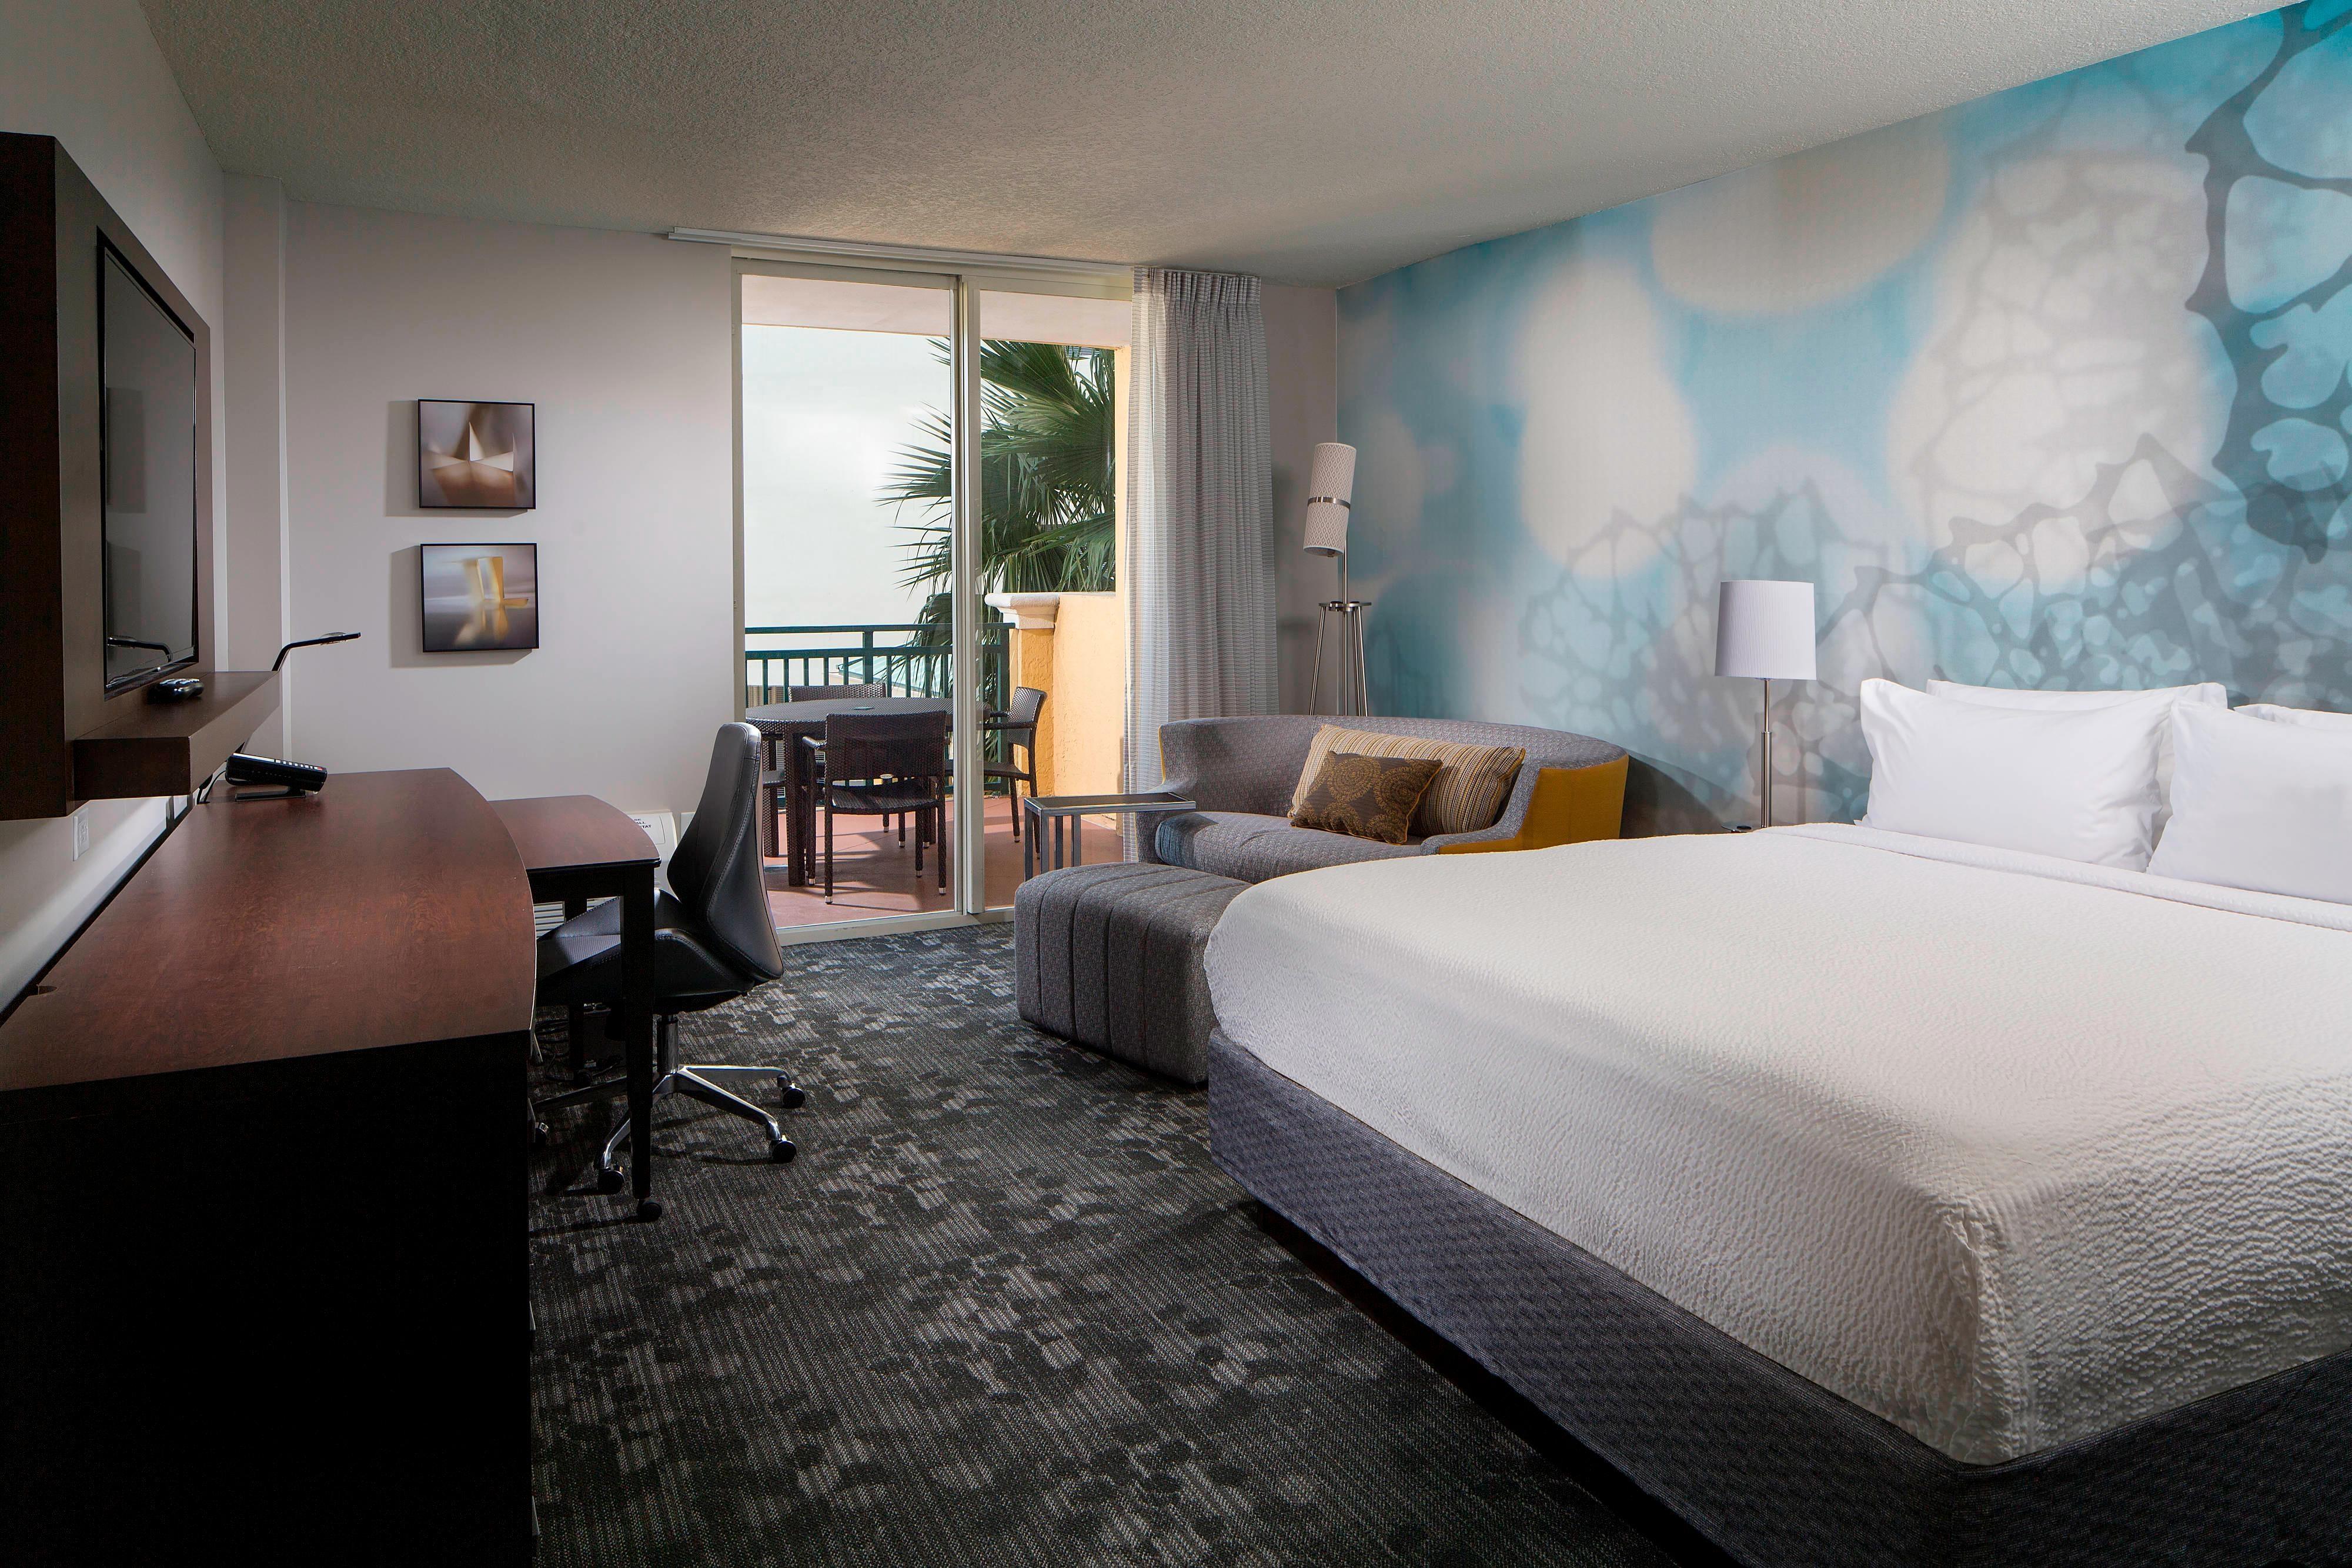 Gästezimmer mit Kingsize-Bett – Balkon